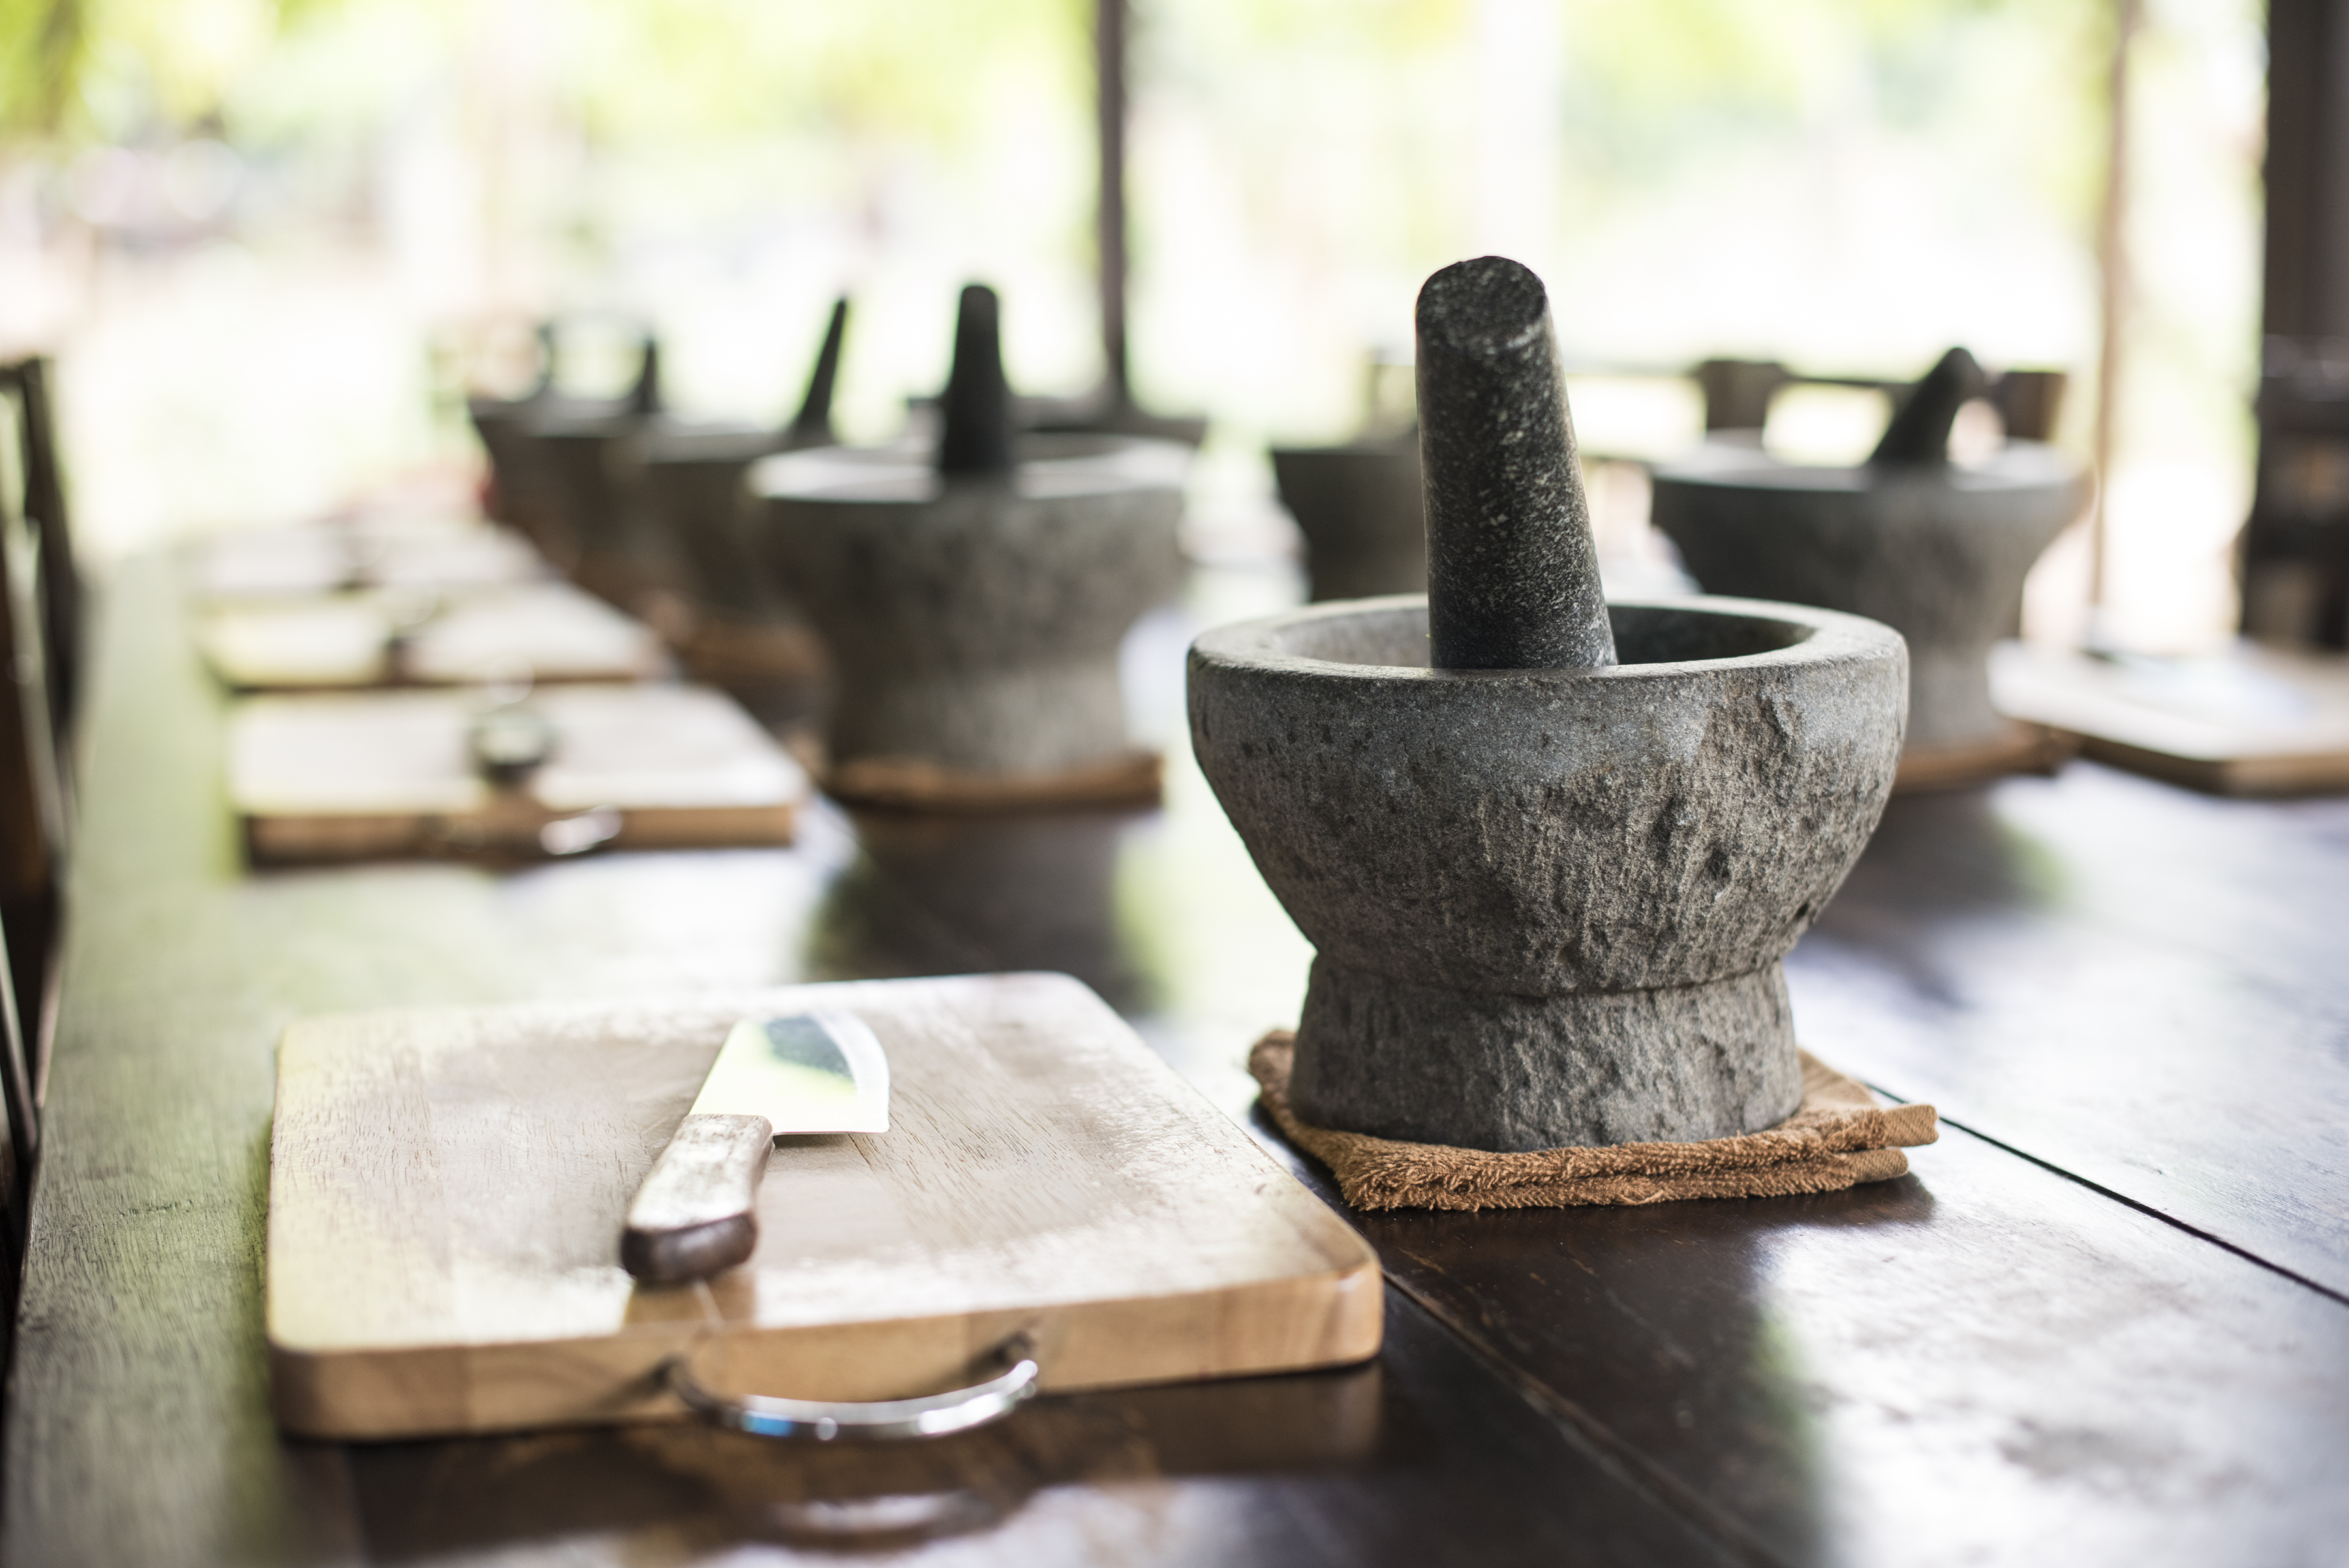 Thai pestle mortar table